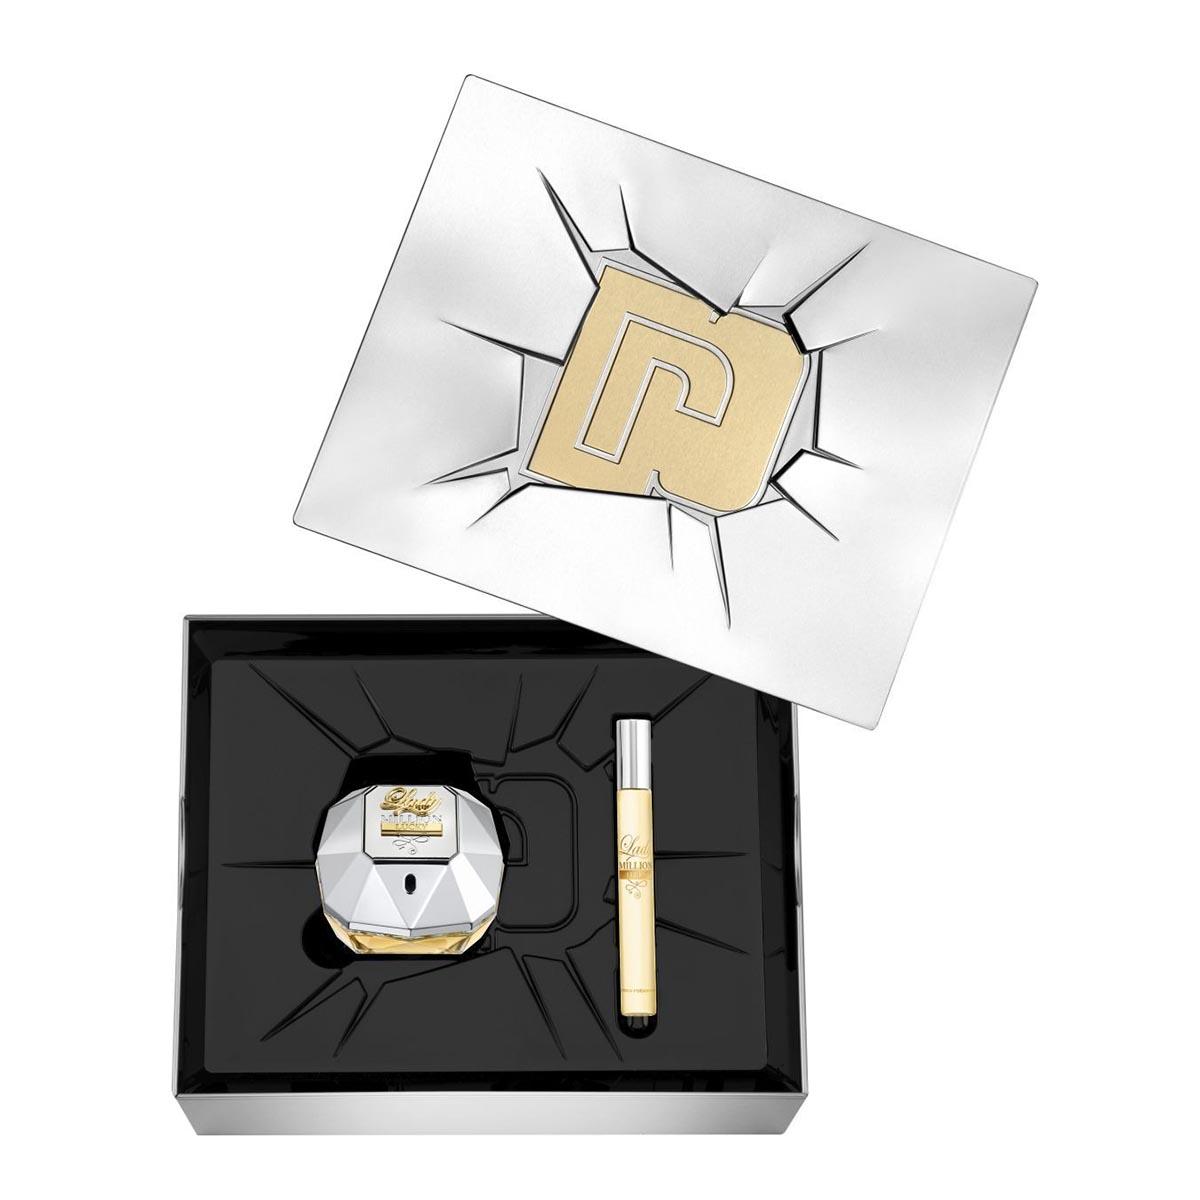 Paco rabanne lady million lucky eau de parfum 80ml vaporizador miniatura 10ml